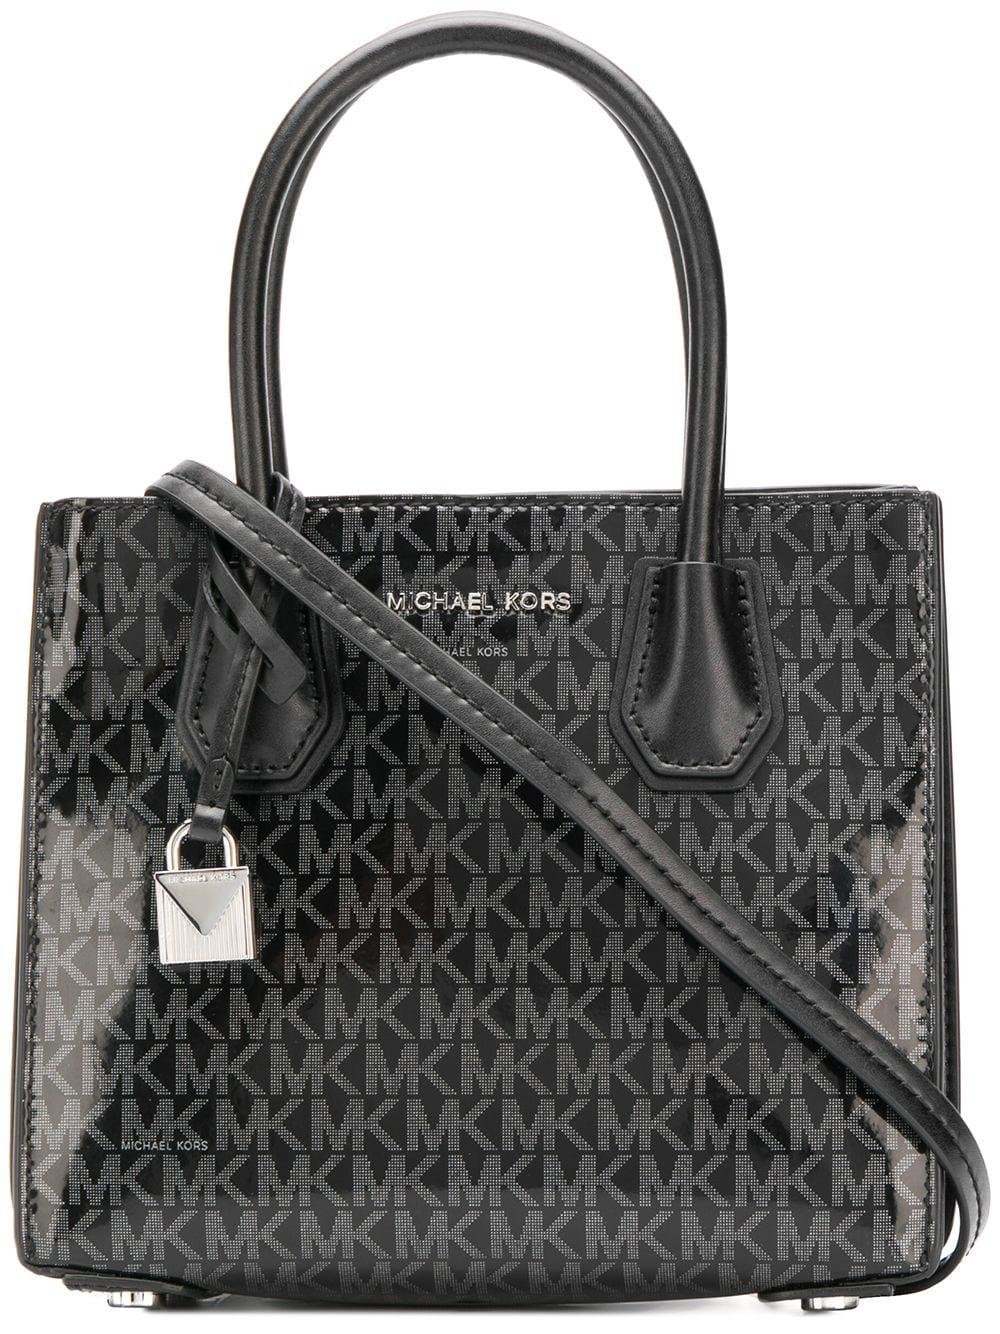 c7b9745c6f4d Lyst - MICHAEL Michael Kors Mercer Leather Tote Bag in Black - Save 11%